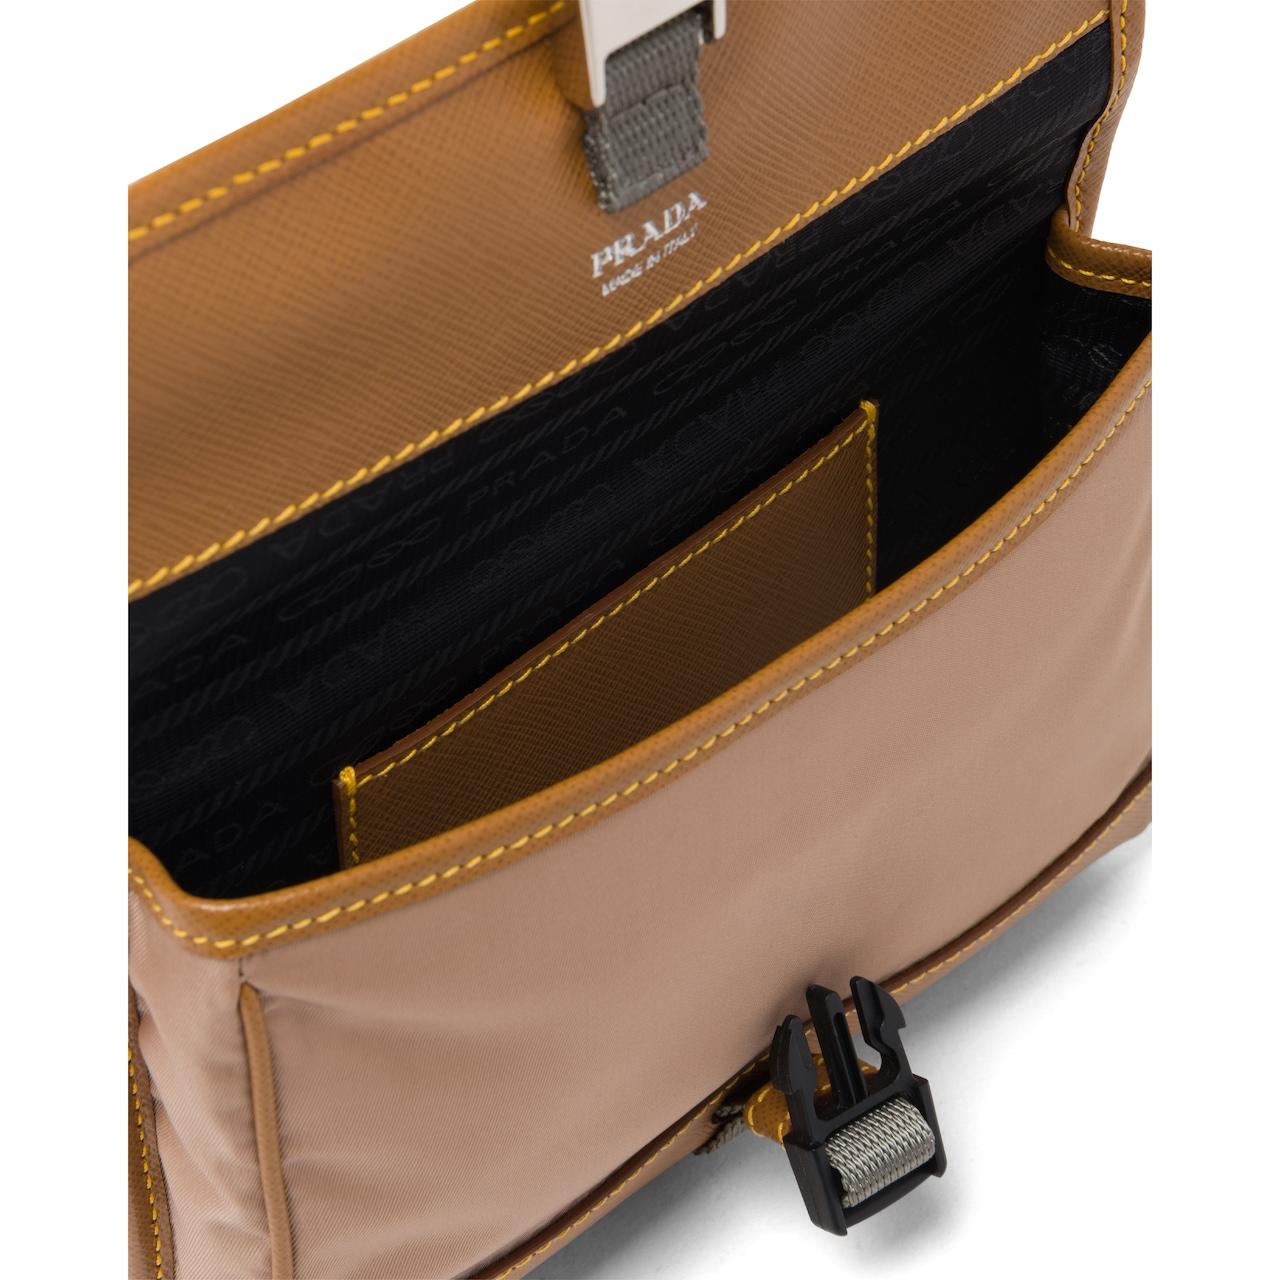 Prada Nylon and Saffiano cellphone case with shoulder strap 4